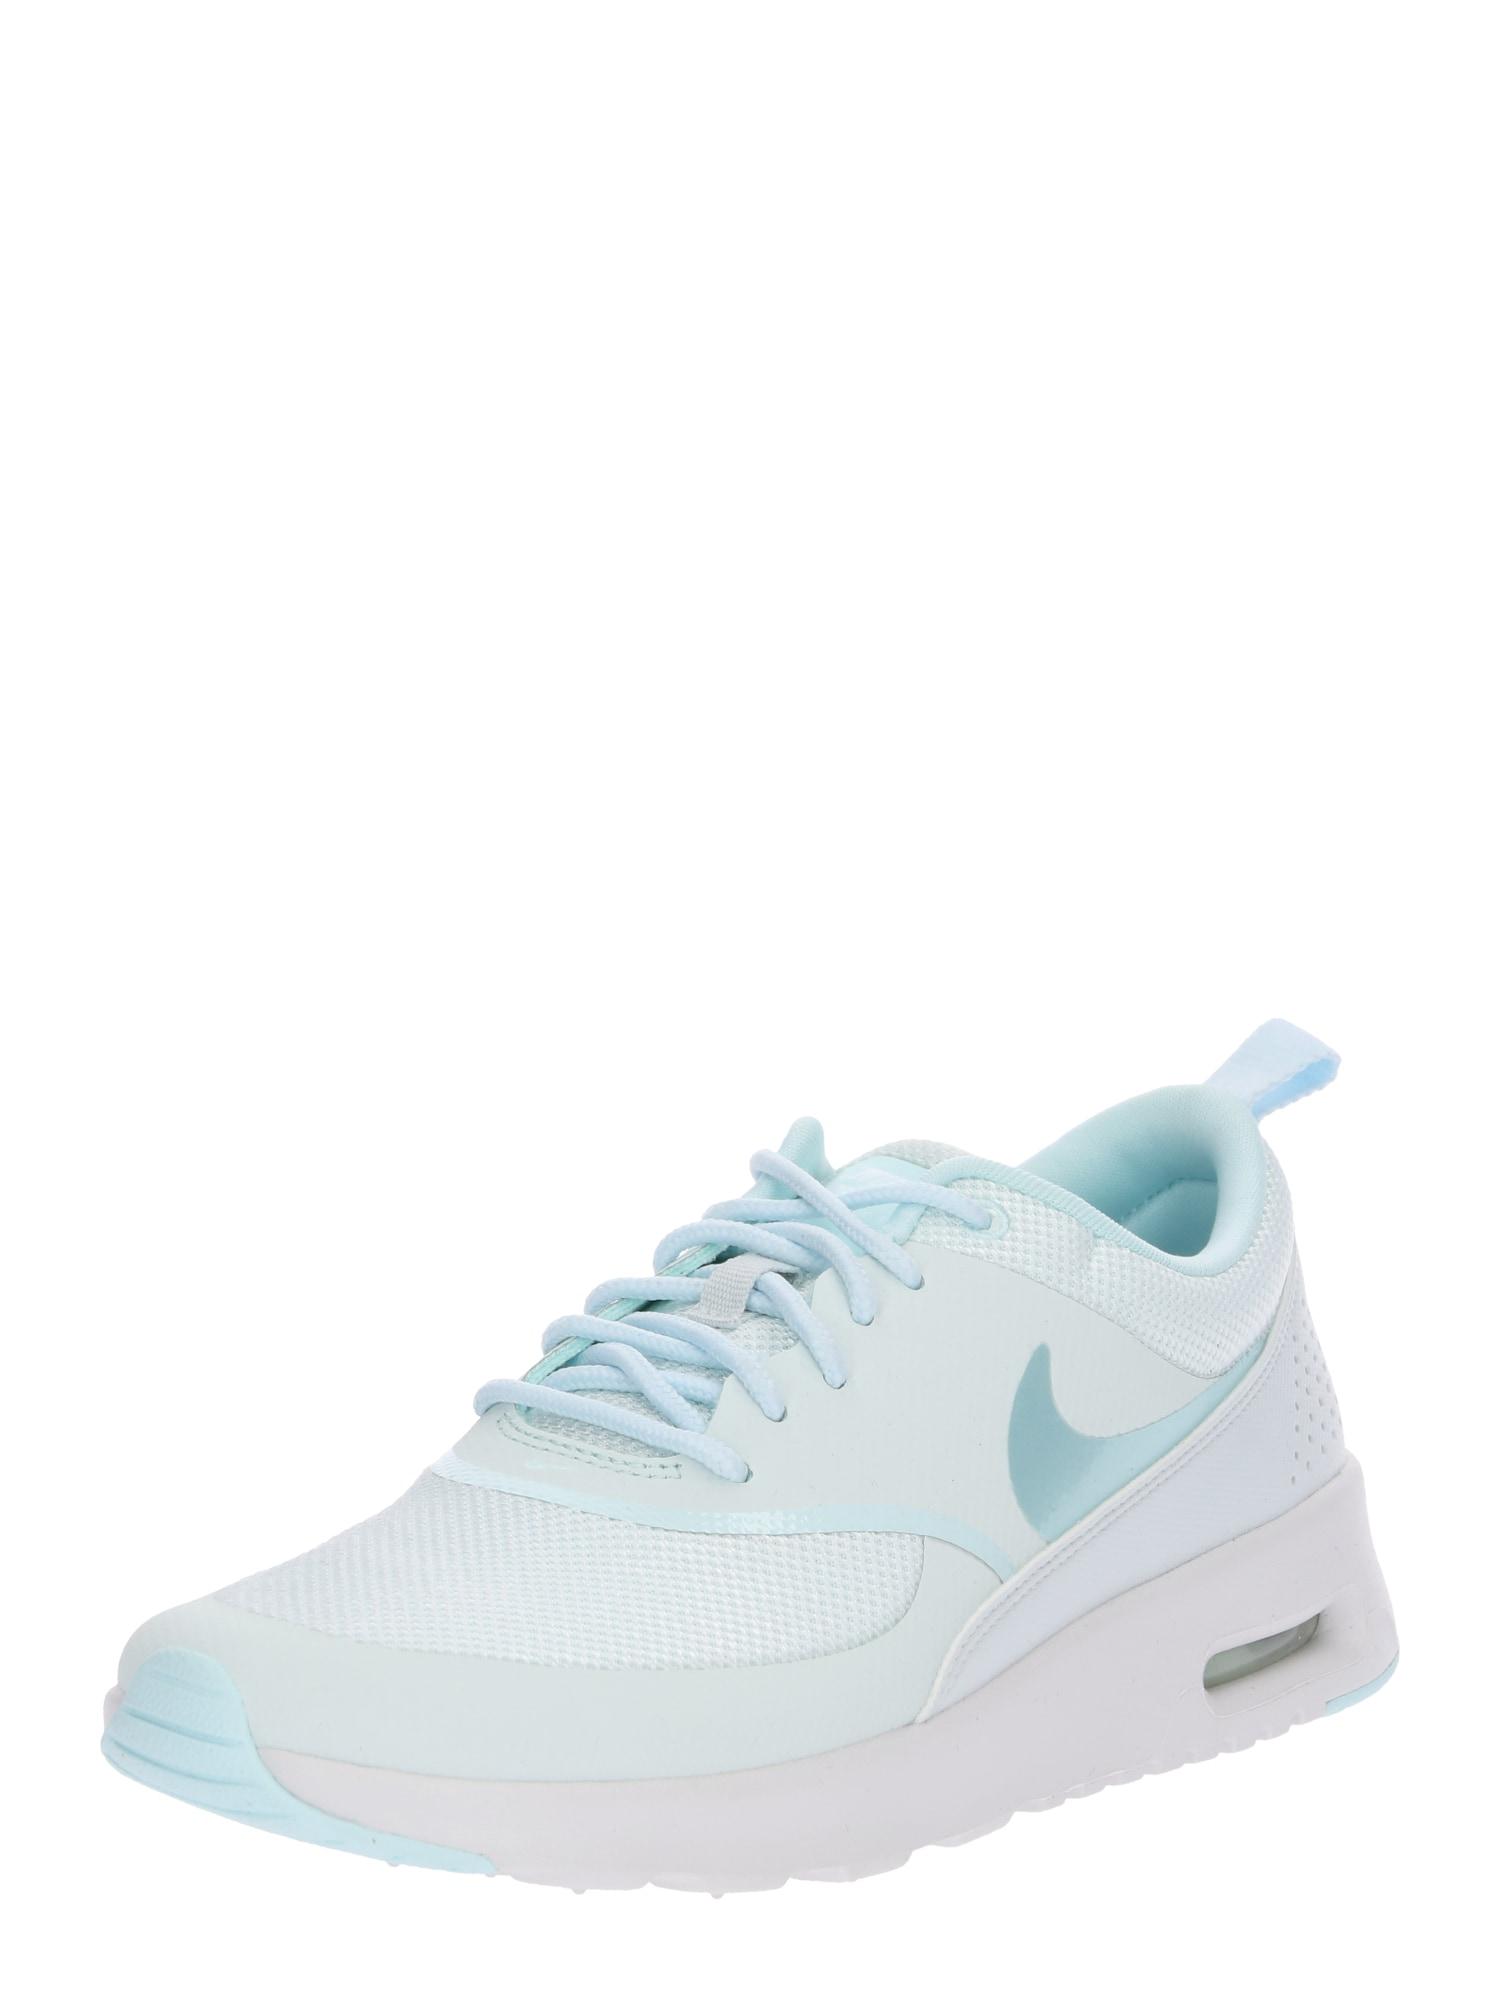 Tenisky Air Max Thea aqua modrá bílá Nike Sportswear